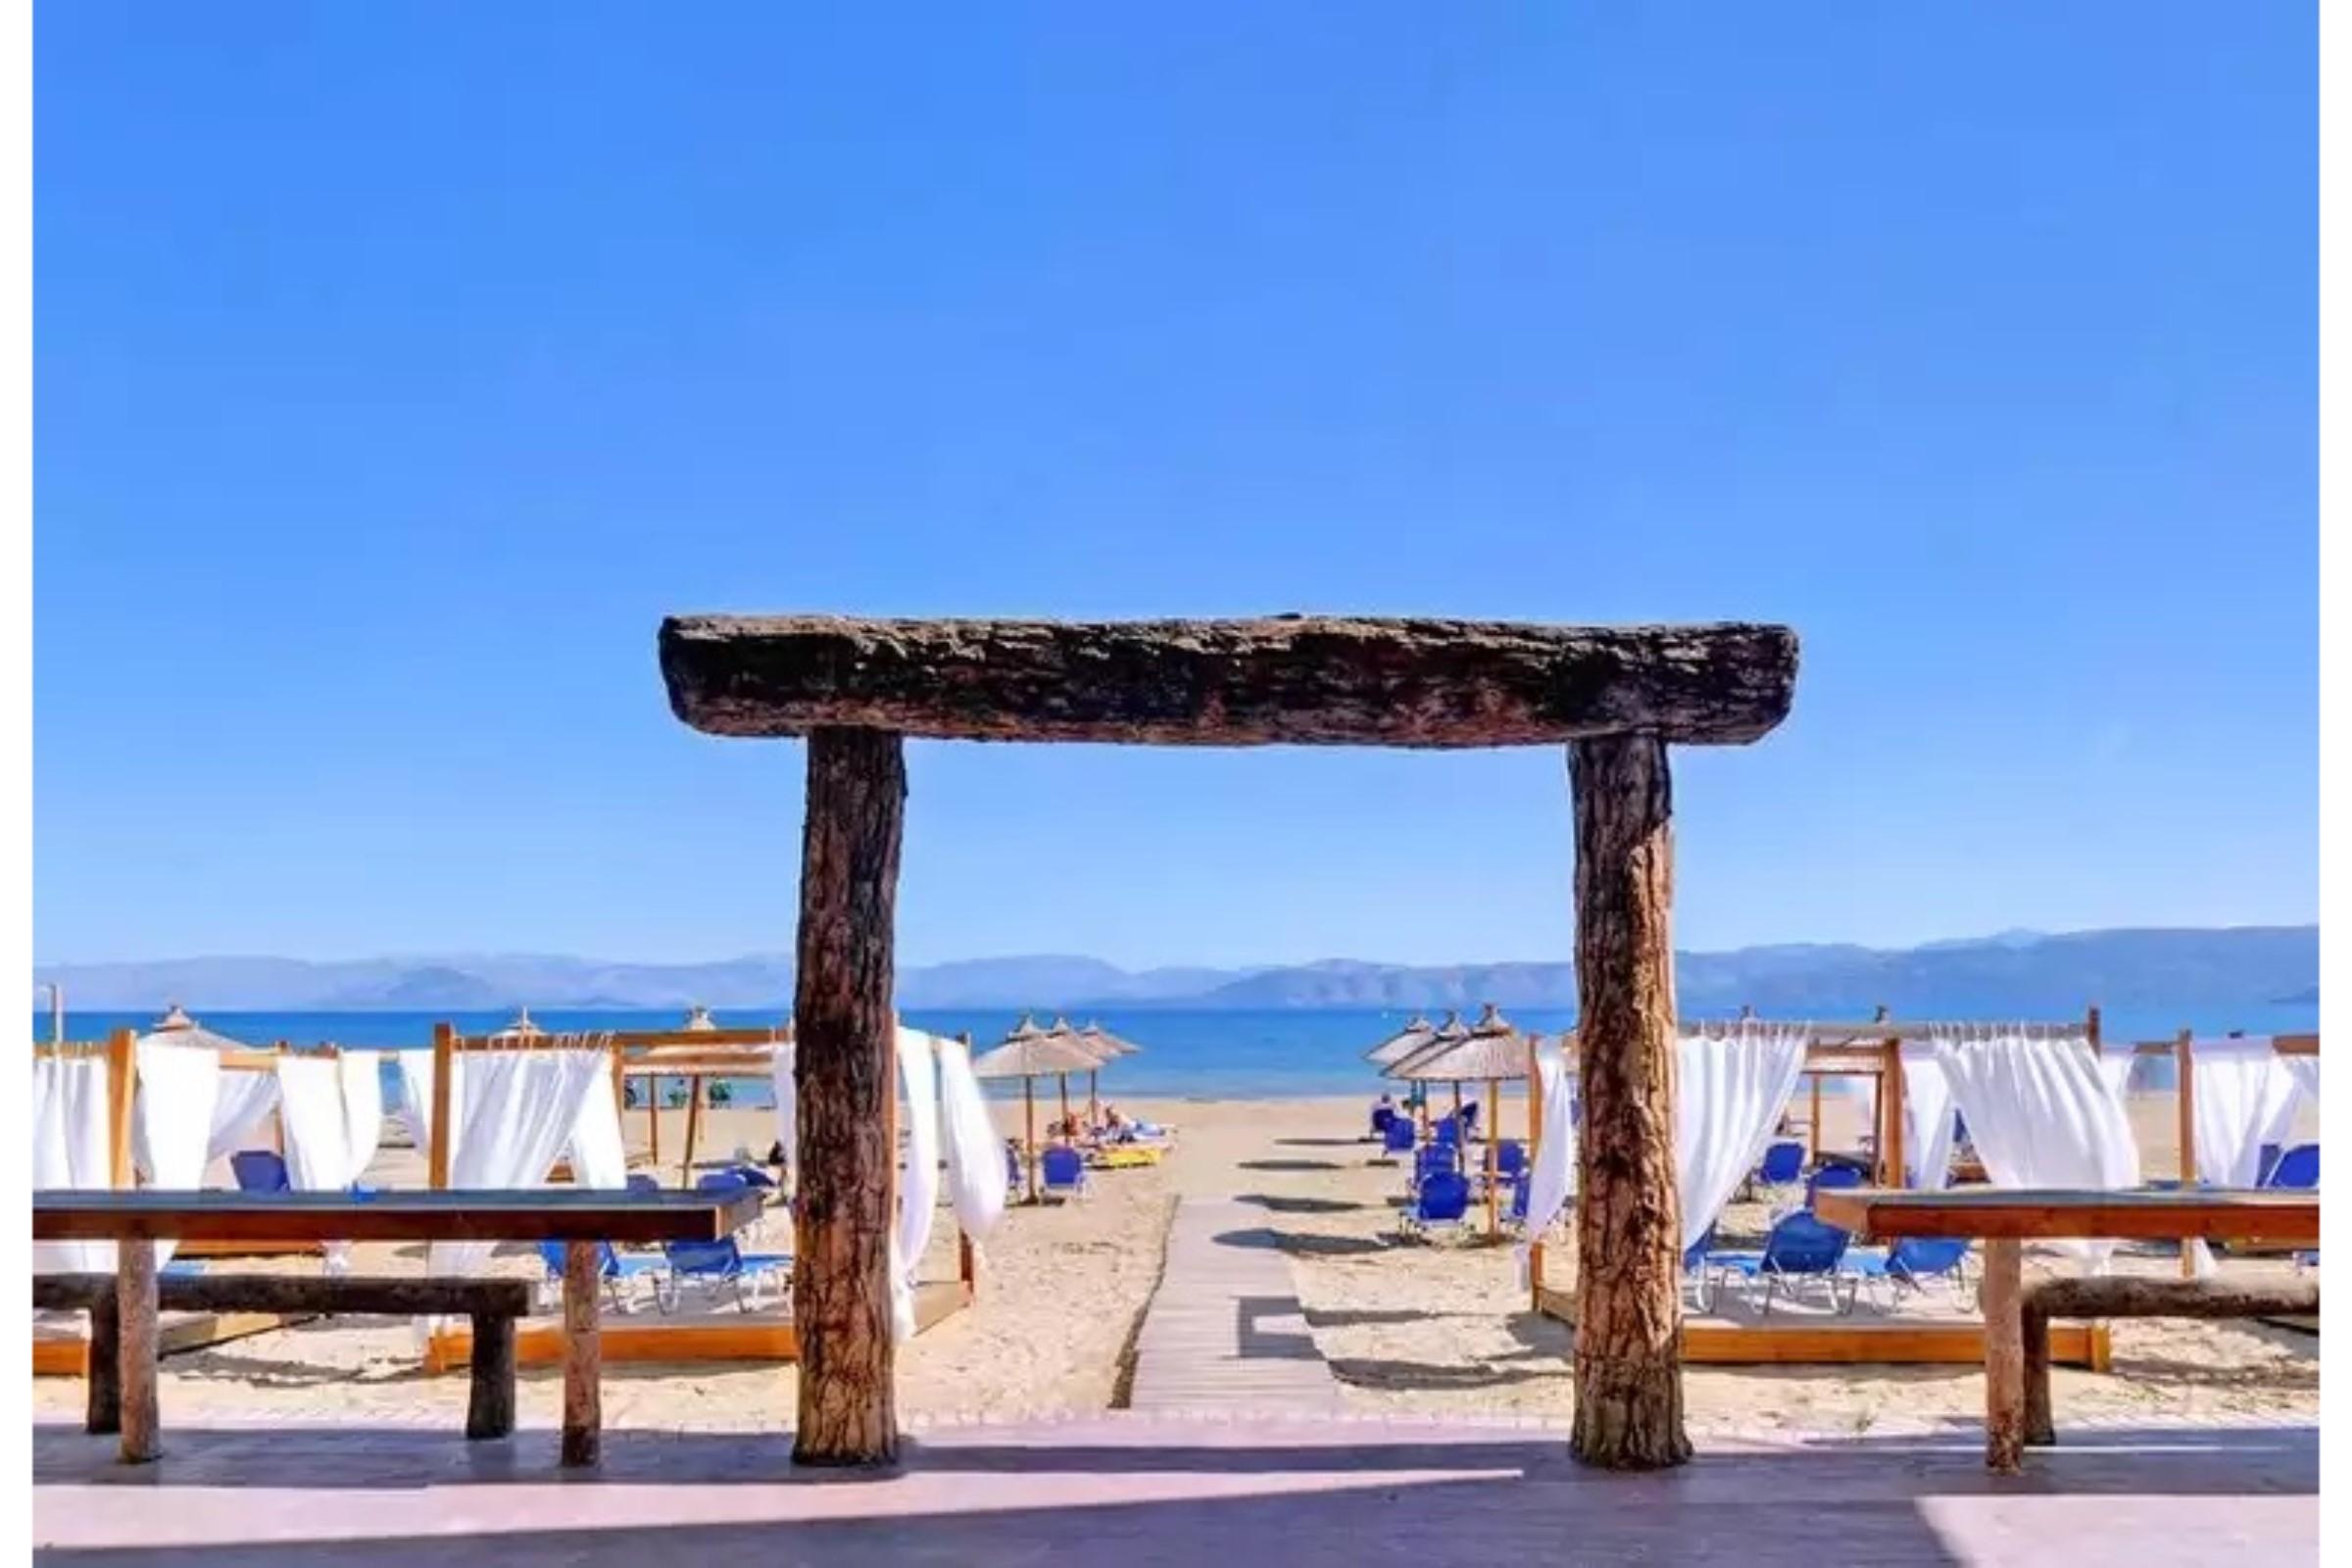 Island Beach Resort